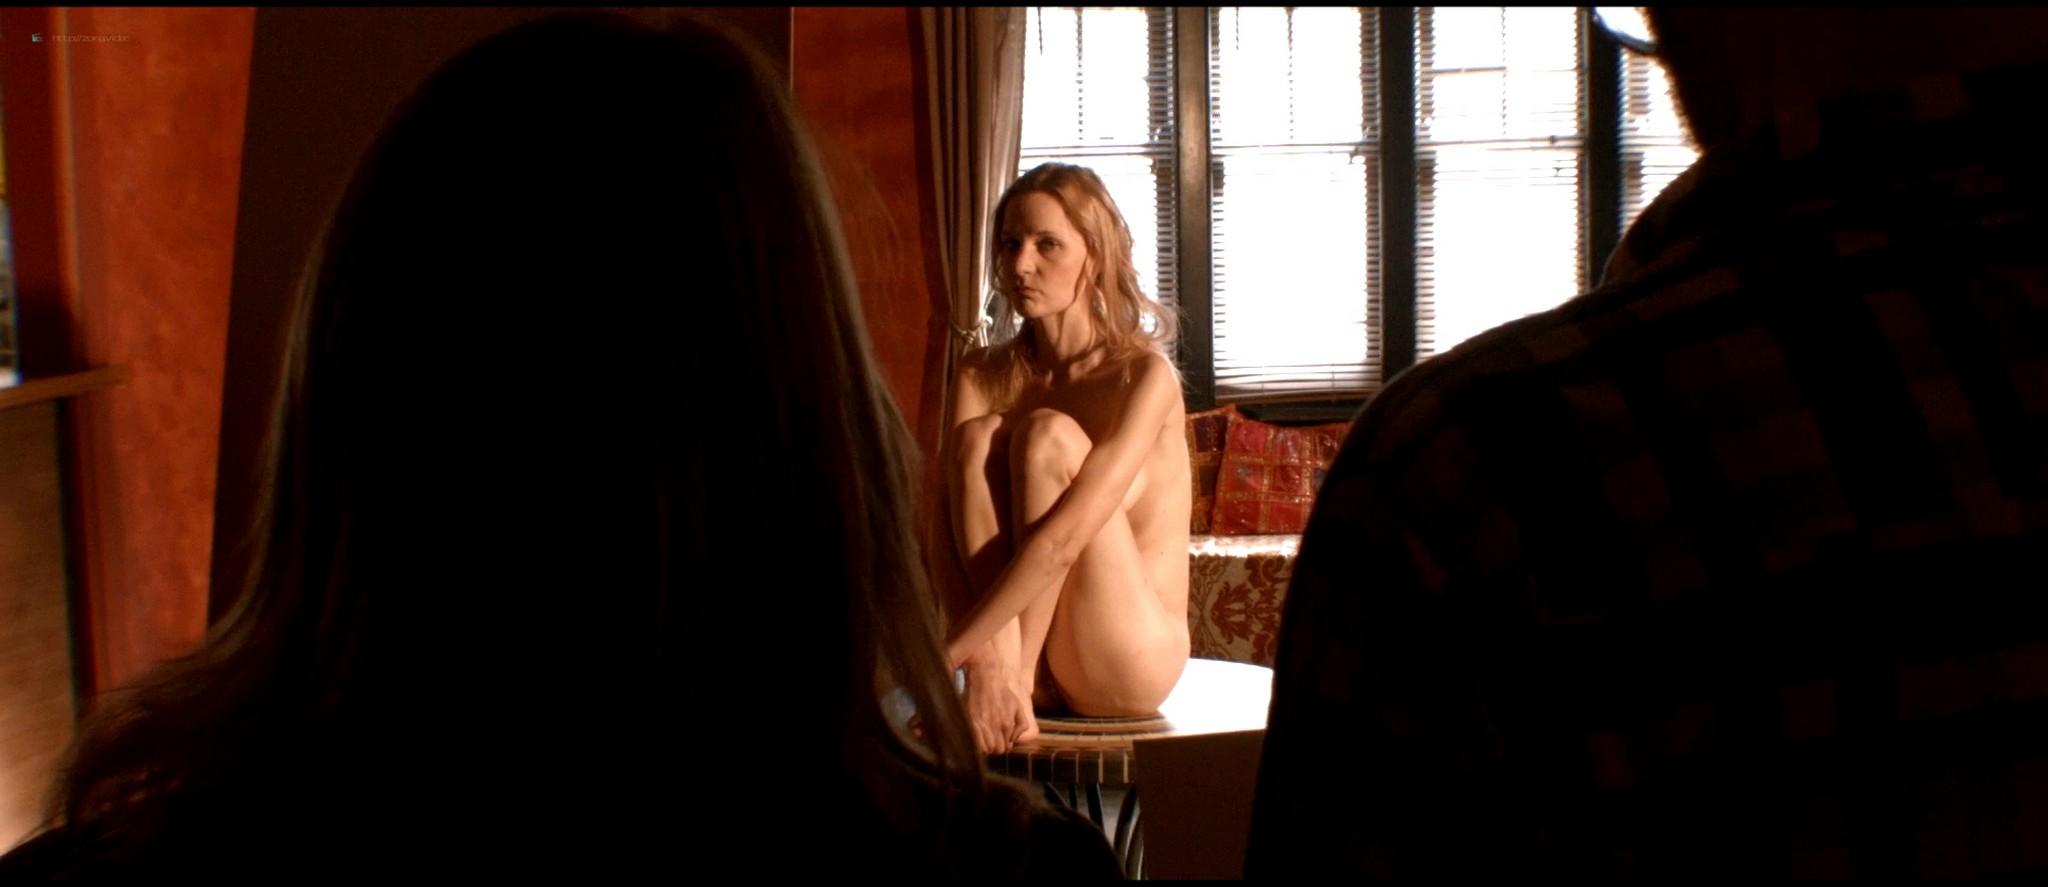 Saara Lamberg nude Jenni Mitchell, April Garreffa nude too - Innuendo (2017) HD 1080p Web (6)